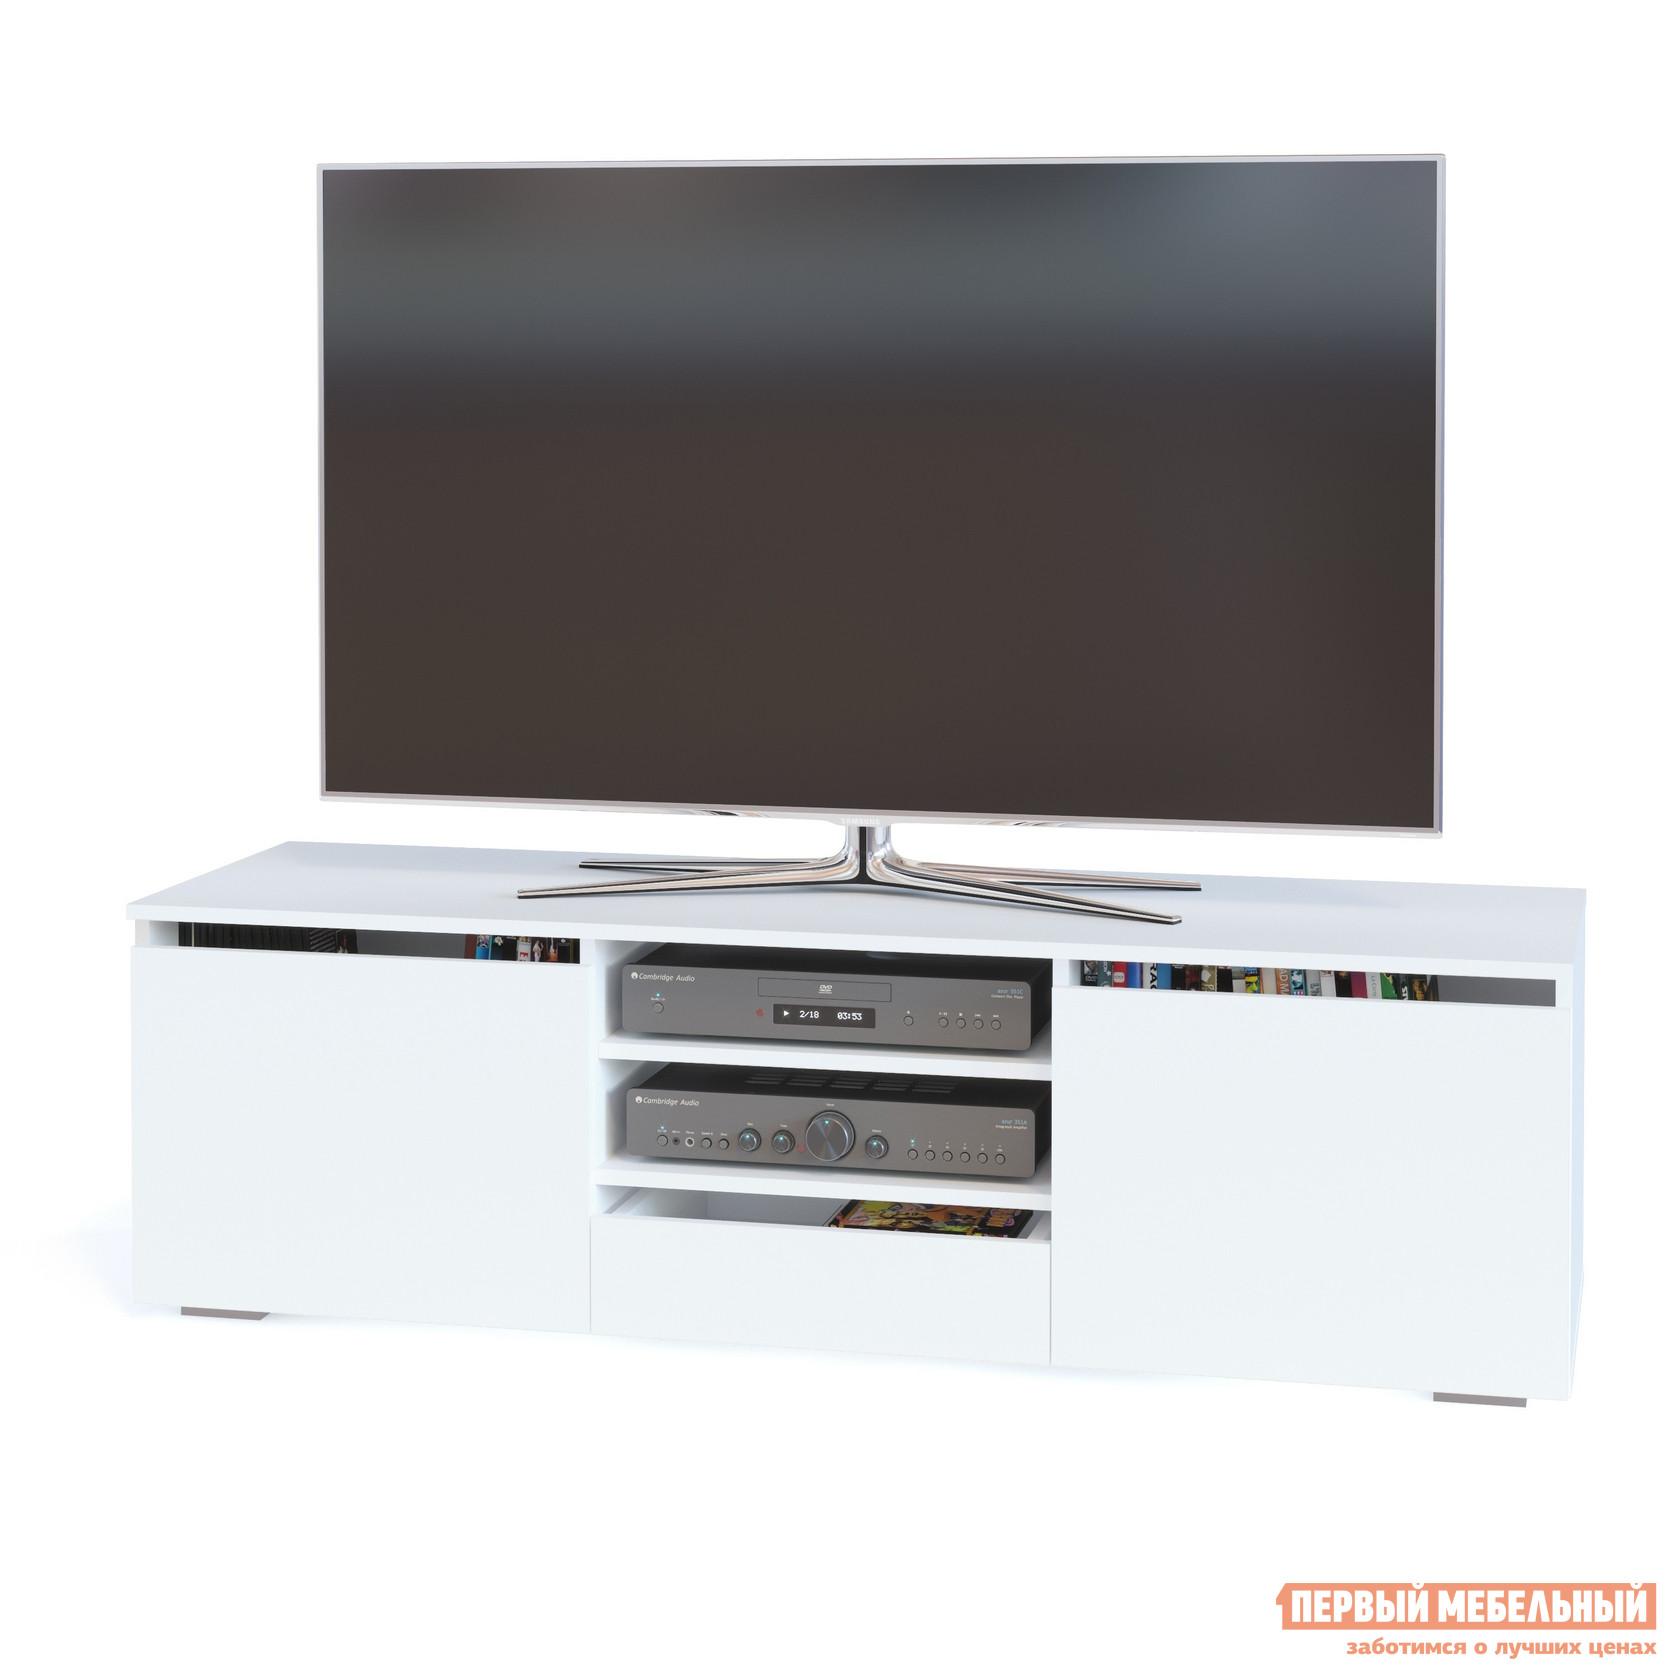 ТВ-тумба Тайга СТМ-300 Белый